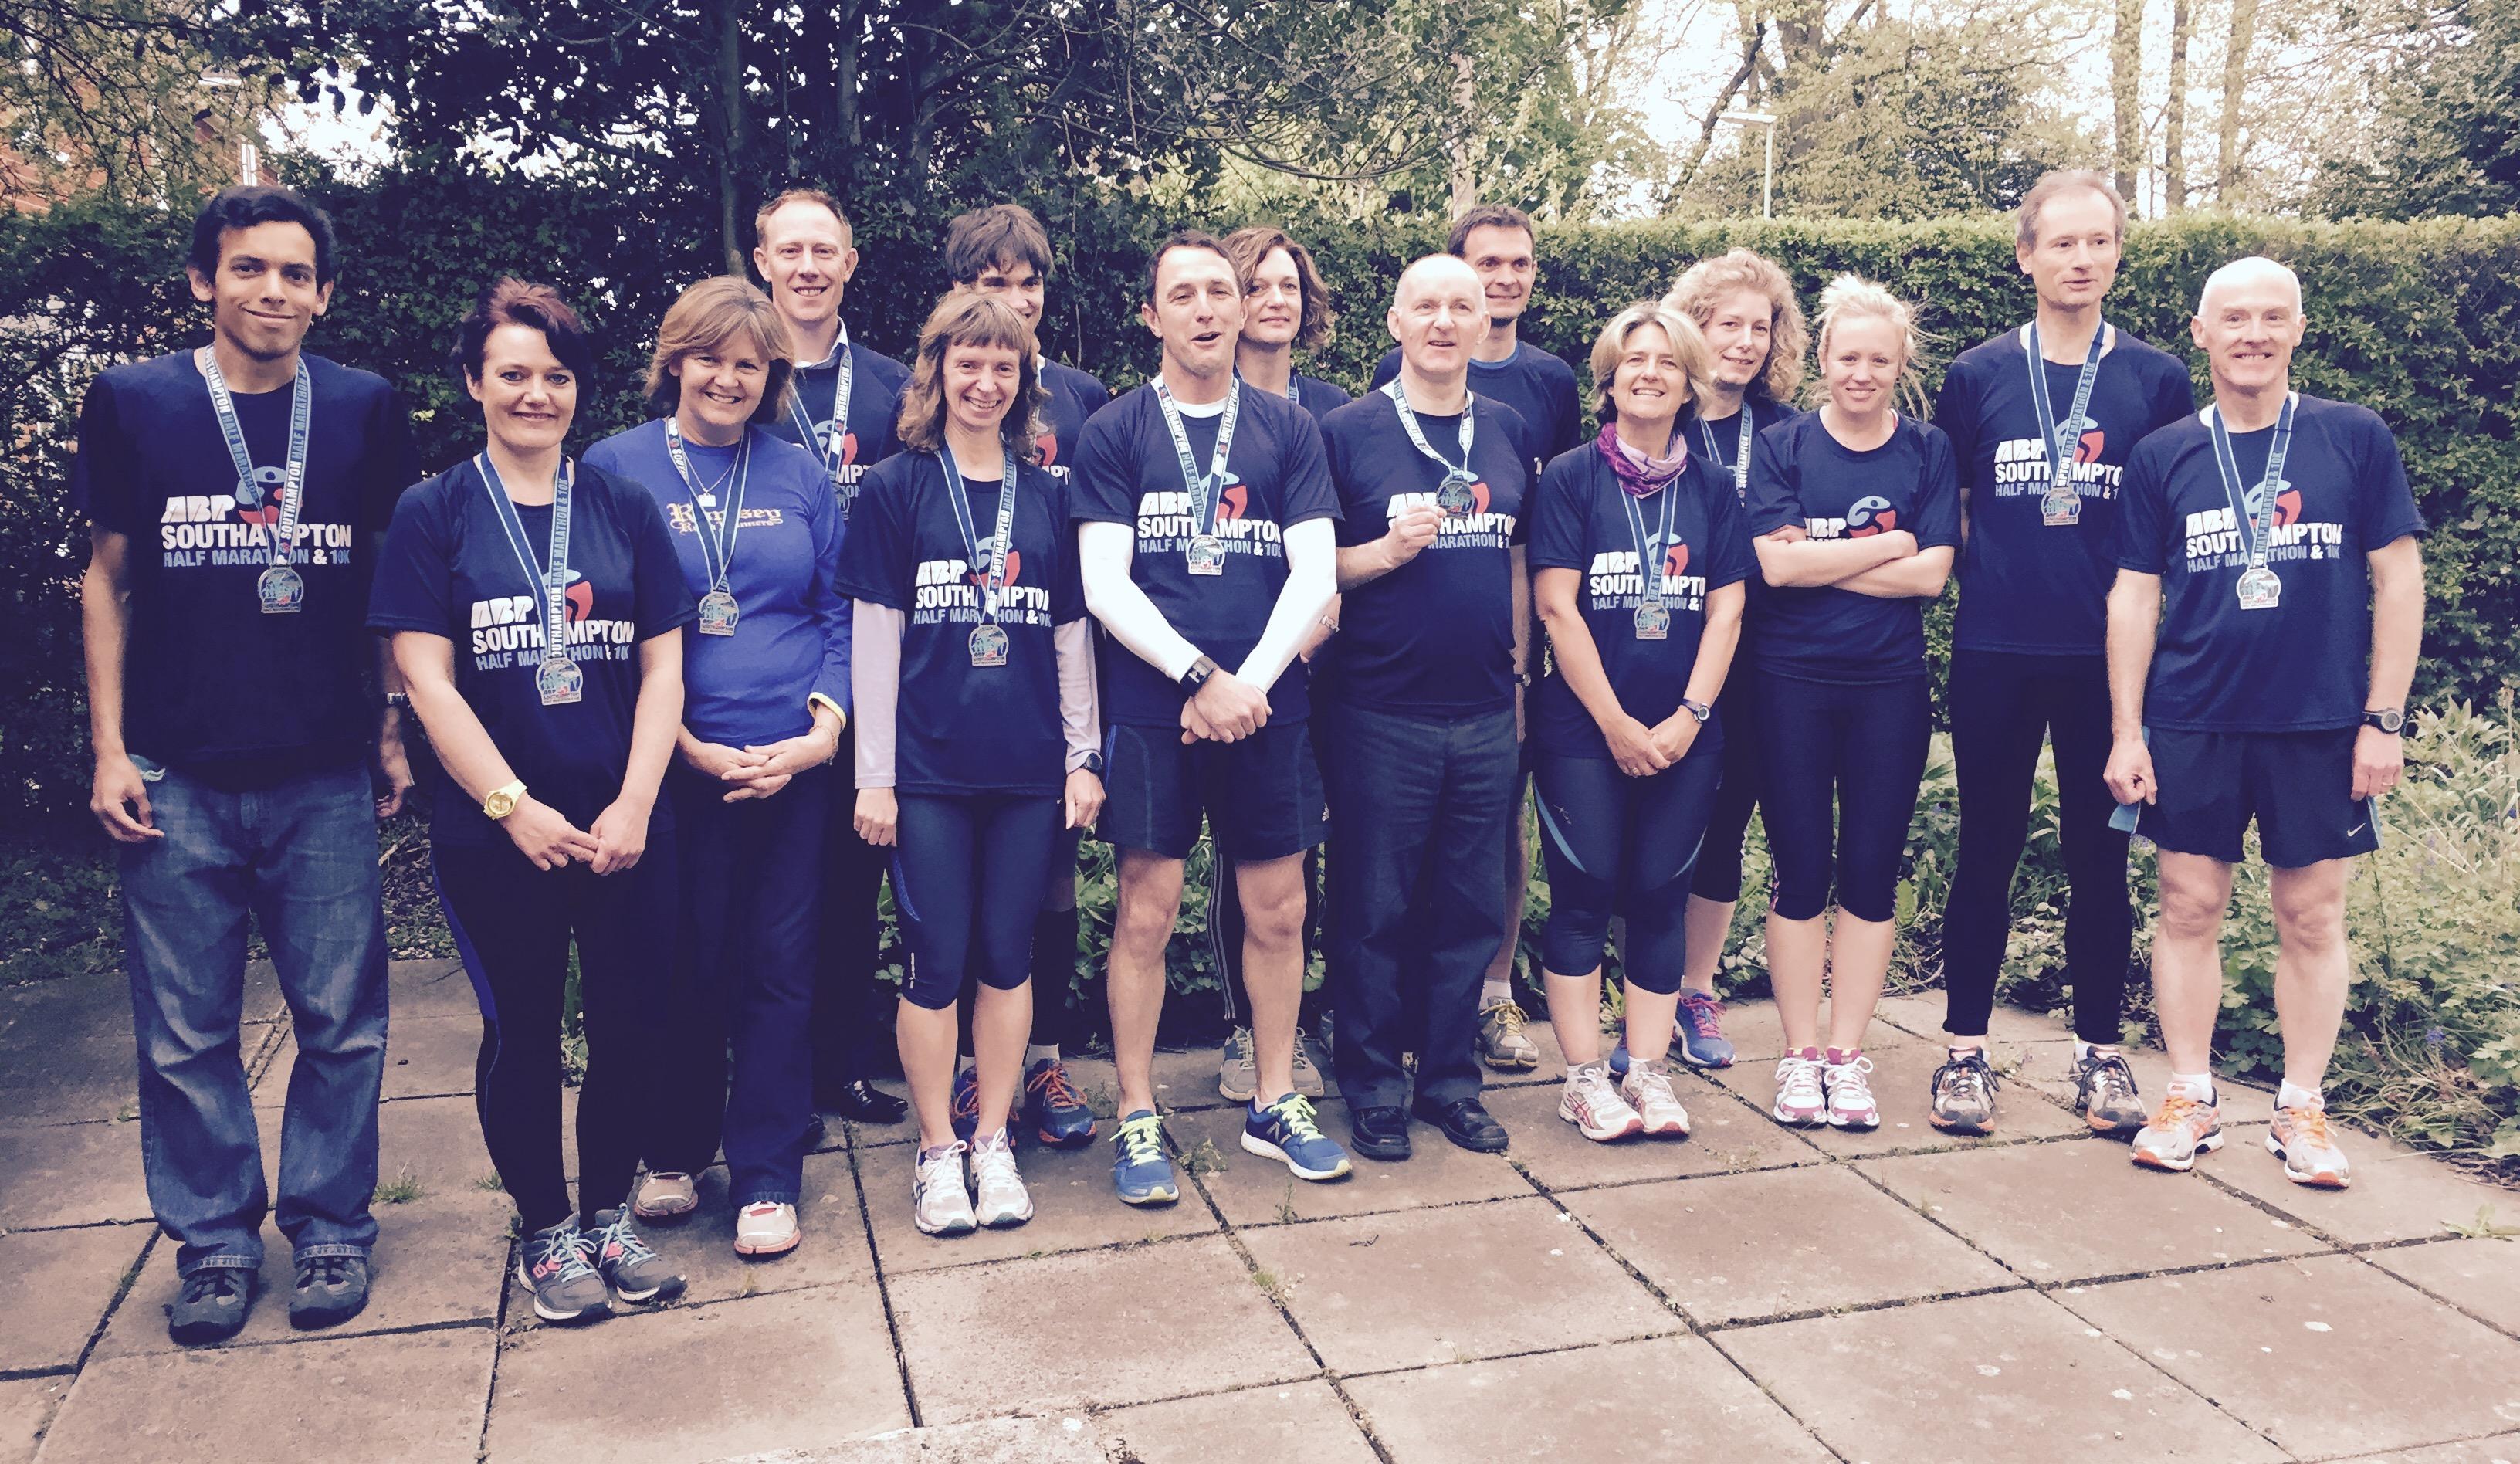 RRR Southampton Half Marathon Finishers 2015